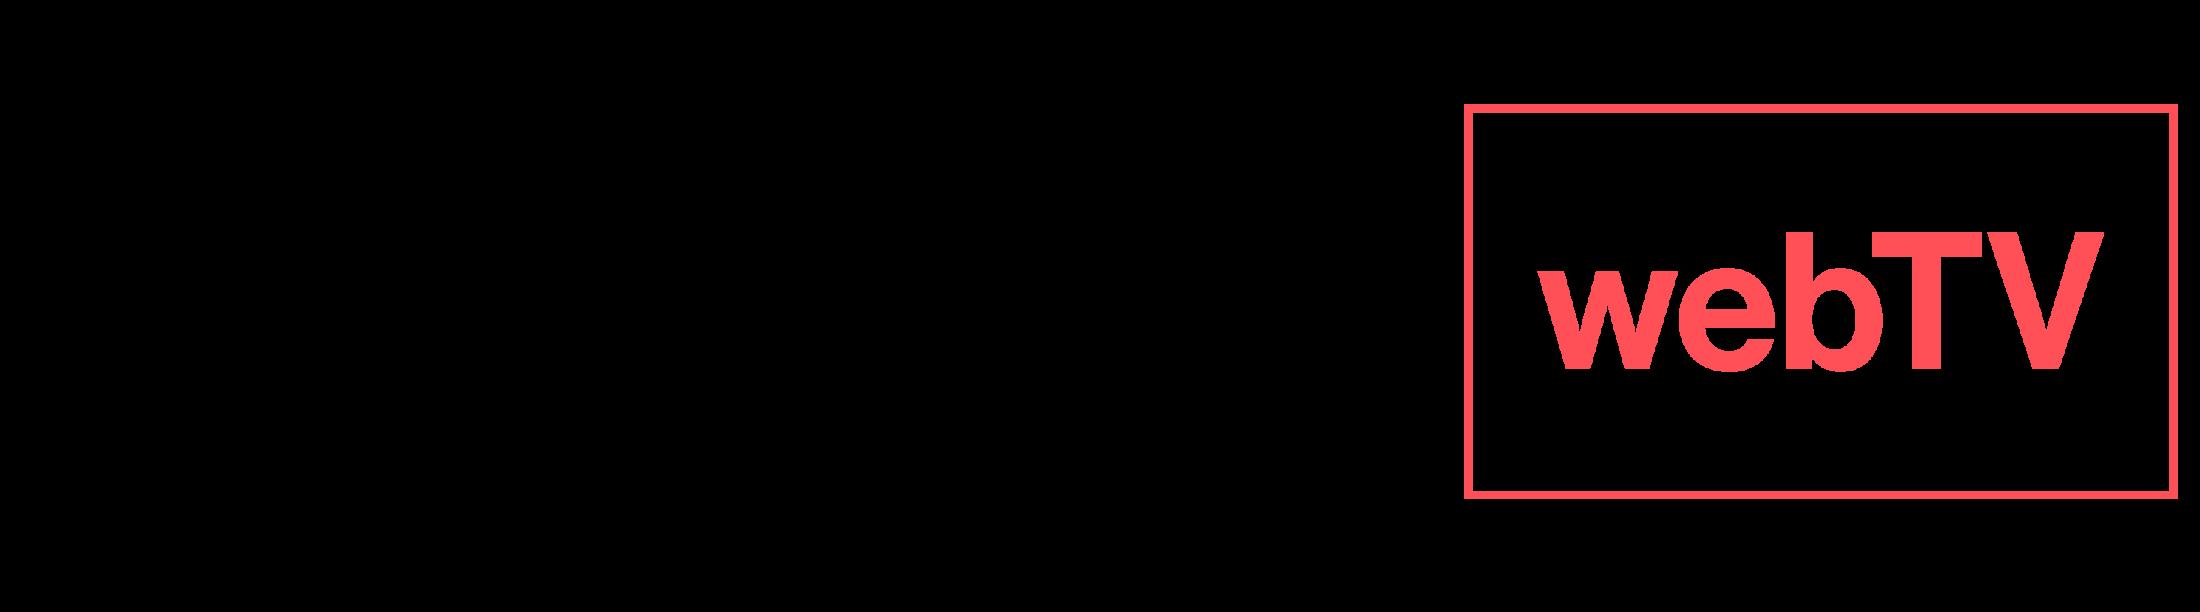 Donizetti Web TV